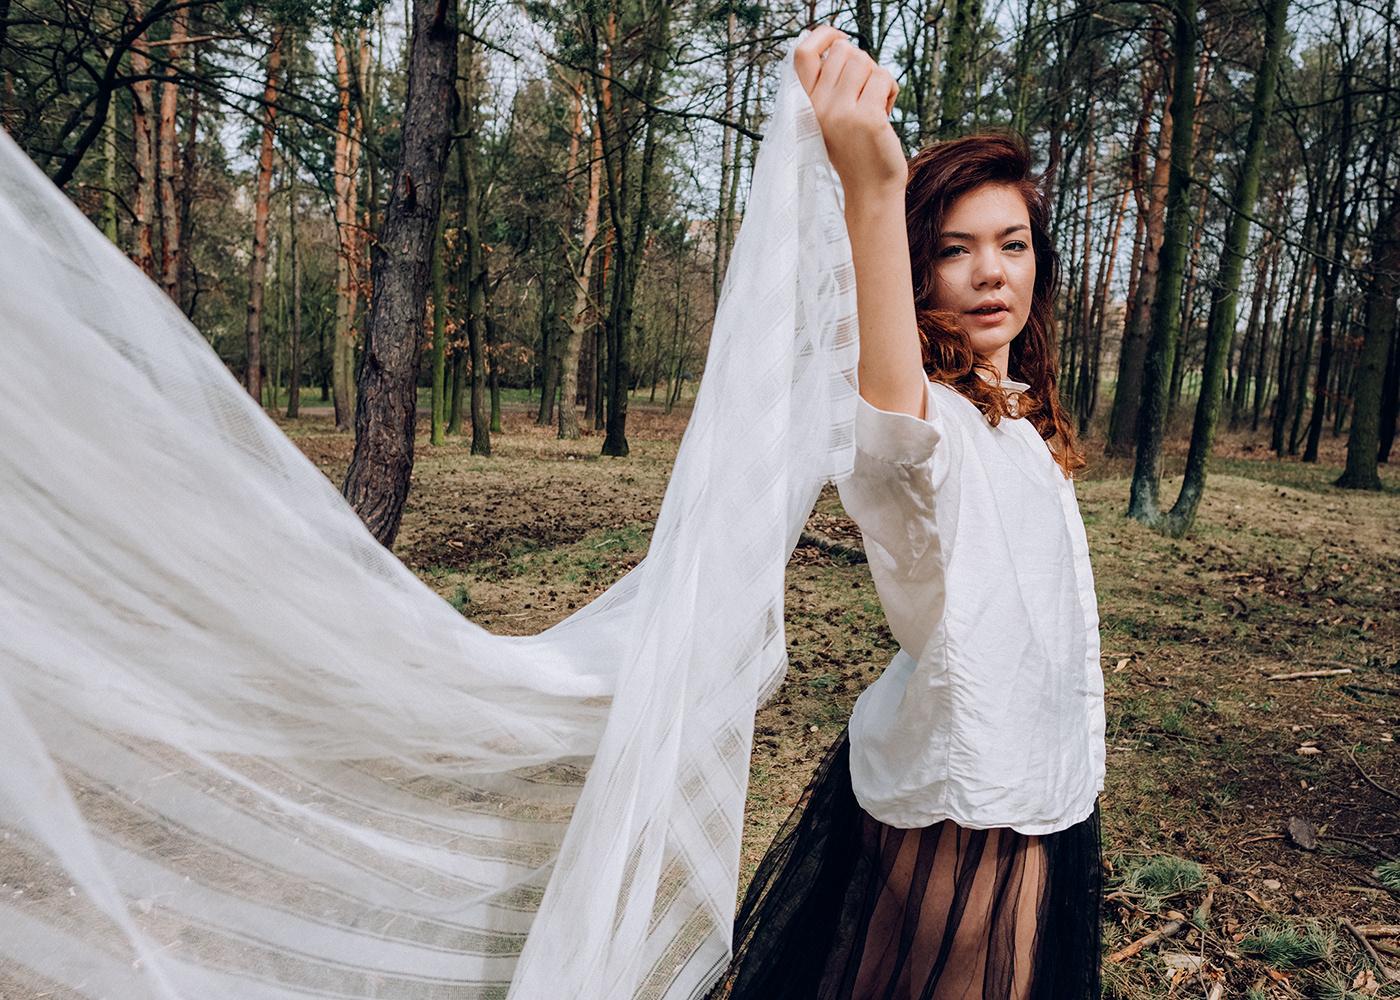 forest Czech Republic actress fashionstory fashioneditorial